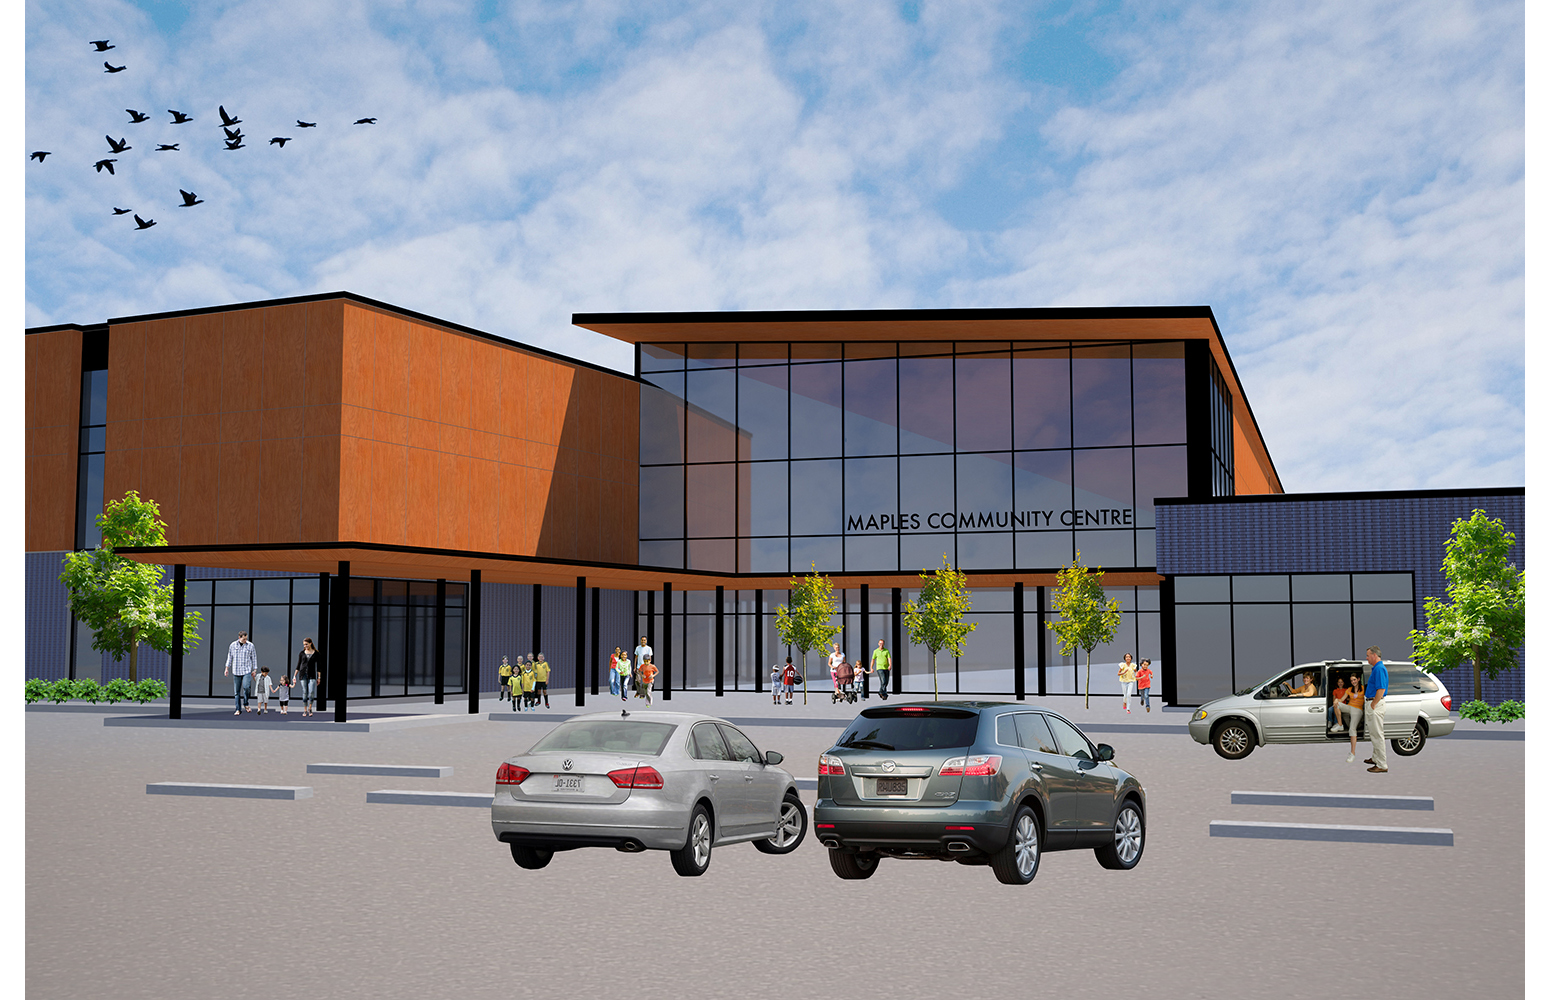 Maples Community Centre, exterior rendering